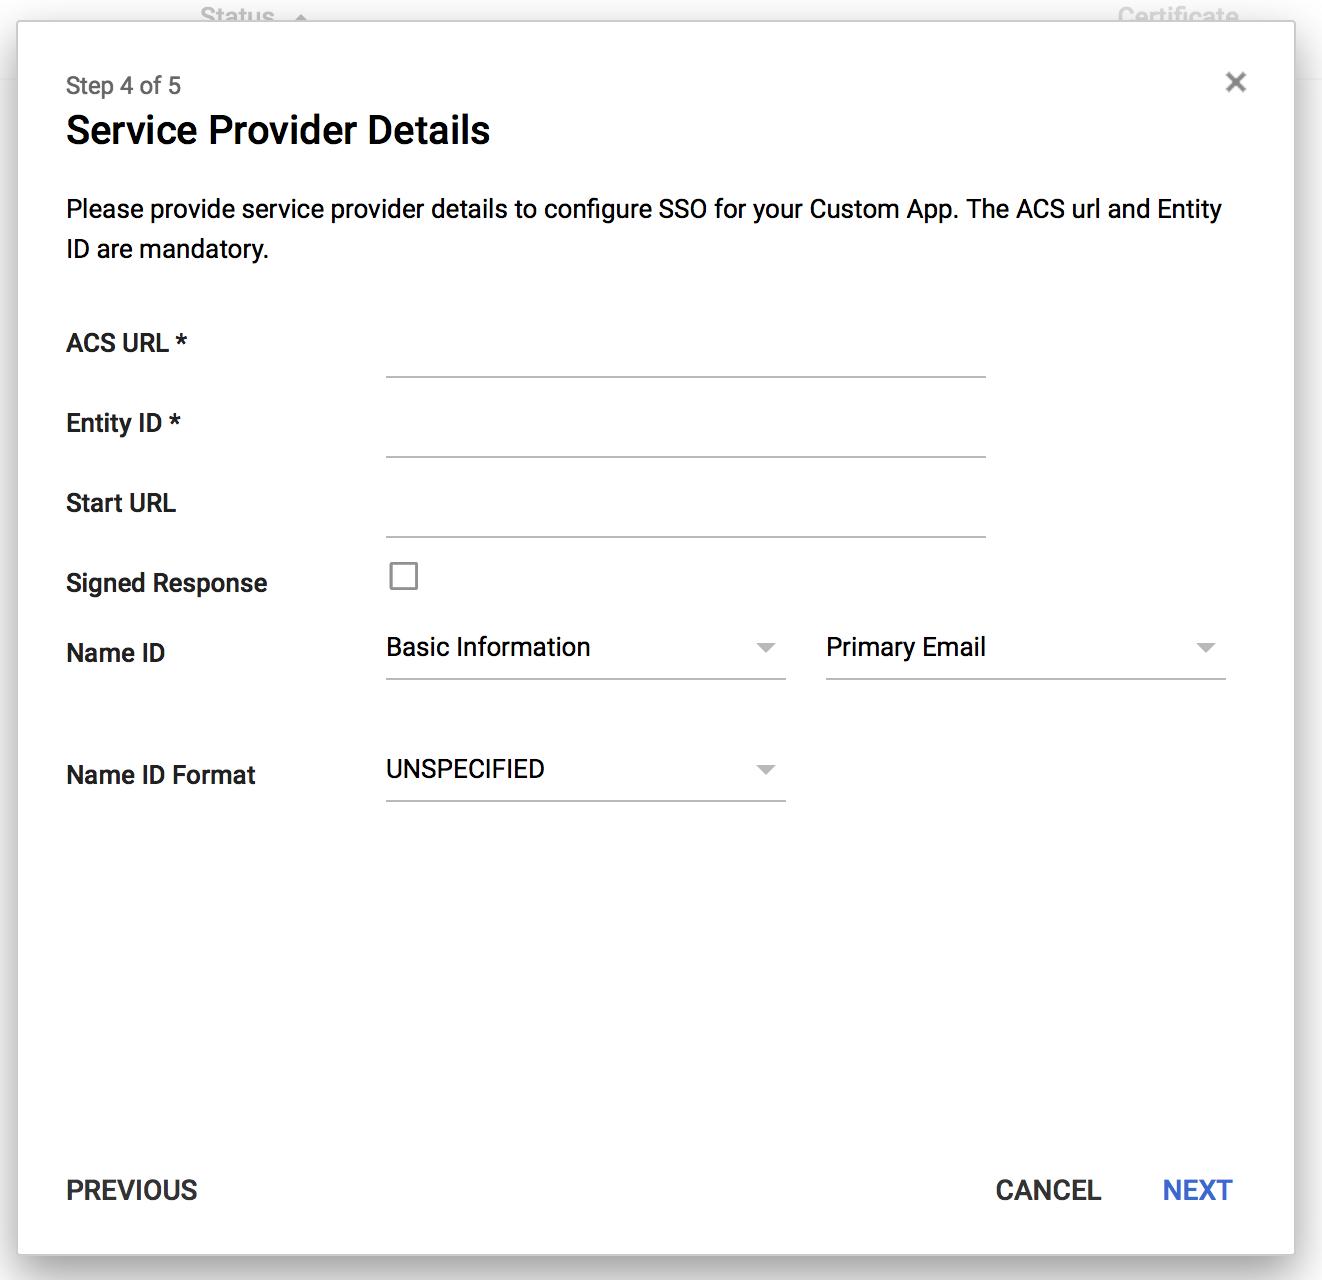 screenshot: Service Provider Details